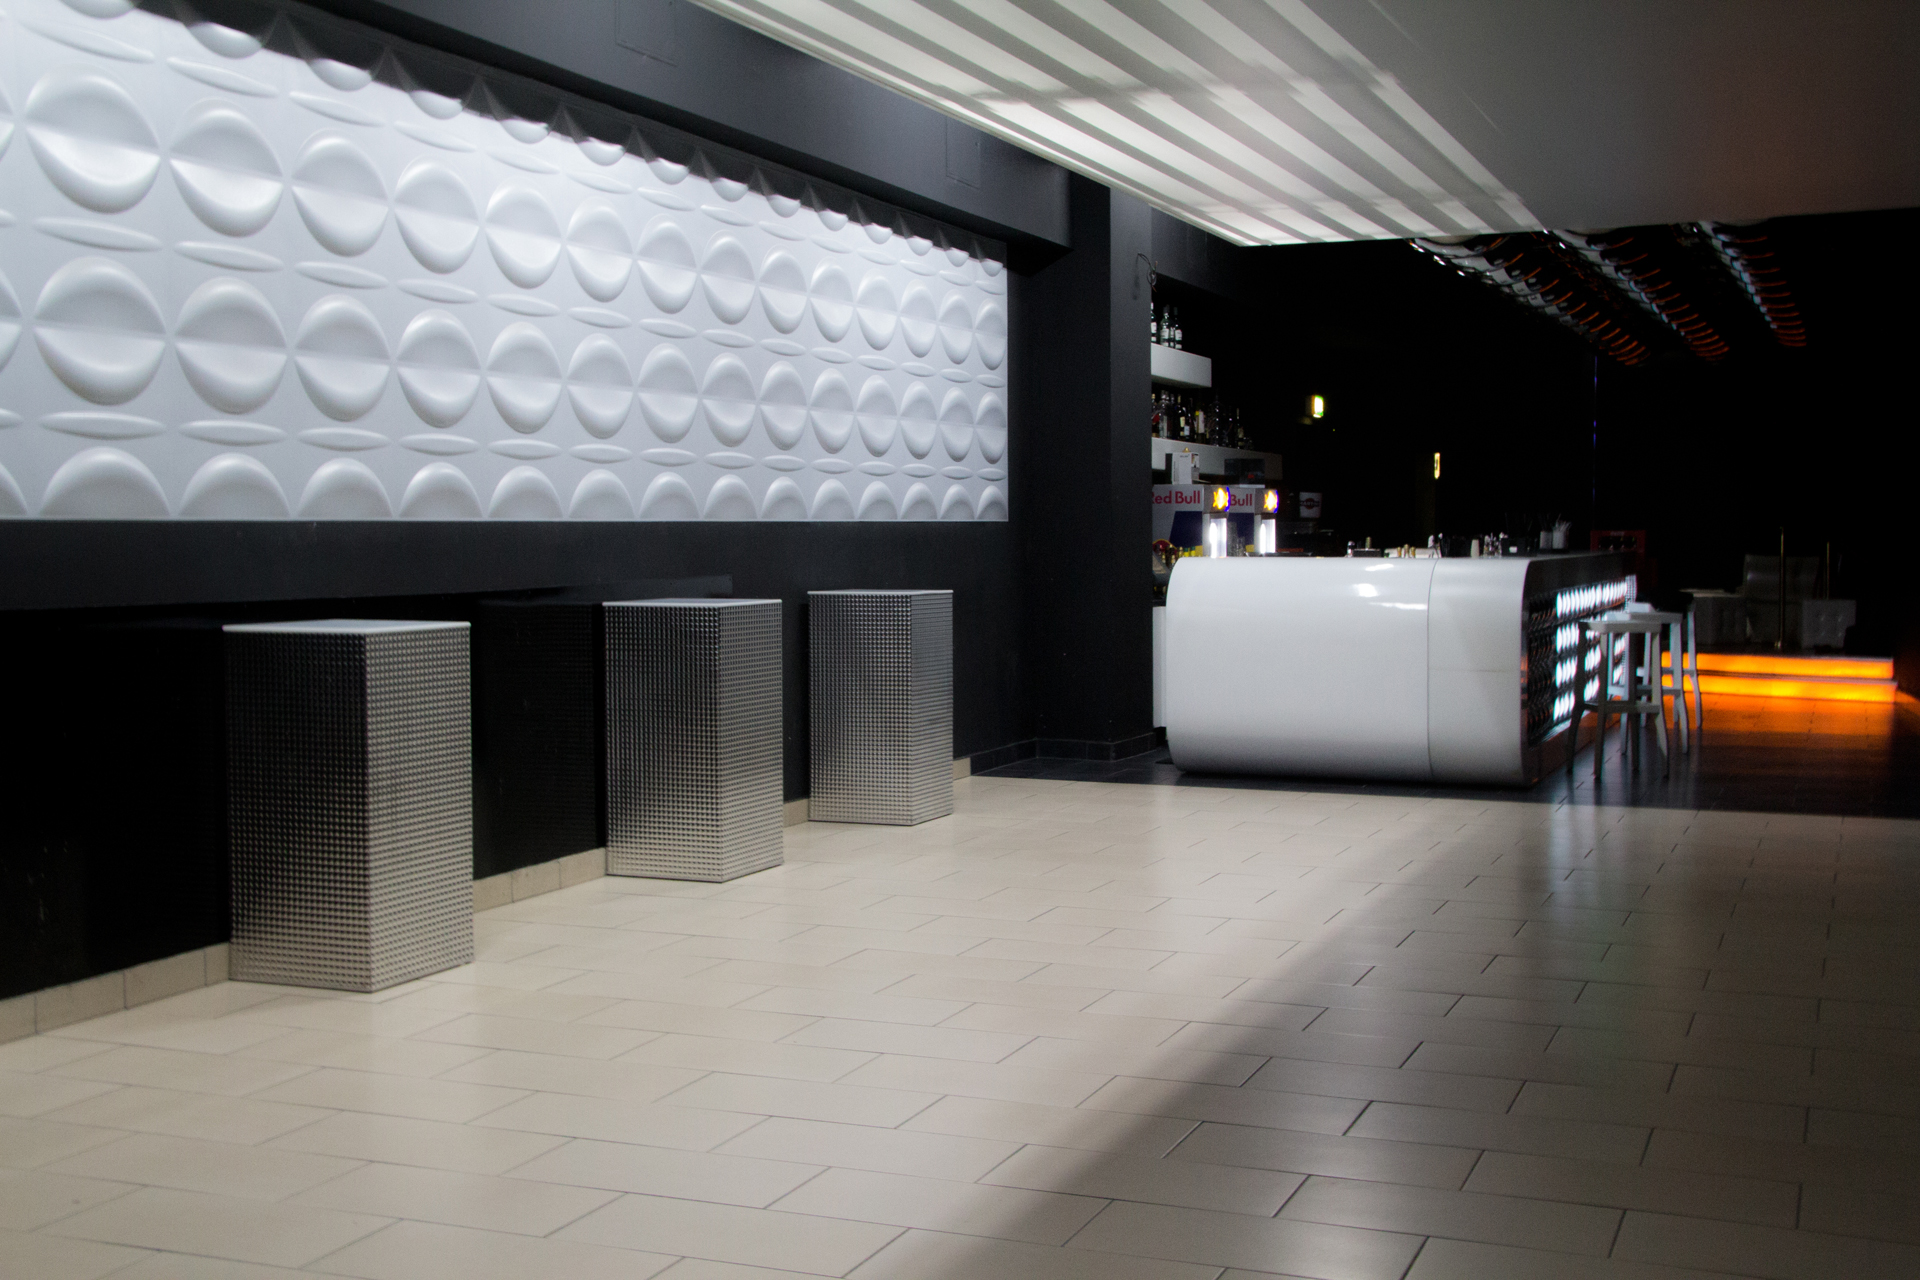 3D Wandpaneele - Referenzen - Phoenix Club - Adel - Deckenpaneele - 3D Tapeten - Wandverkleidung - Verblender